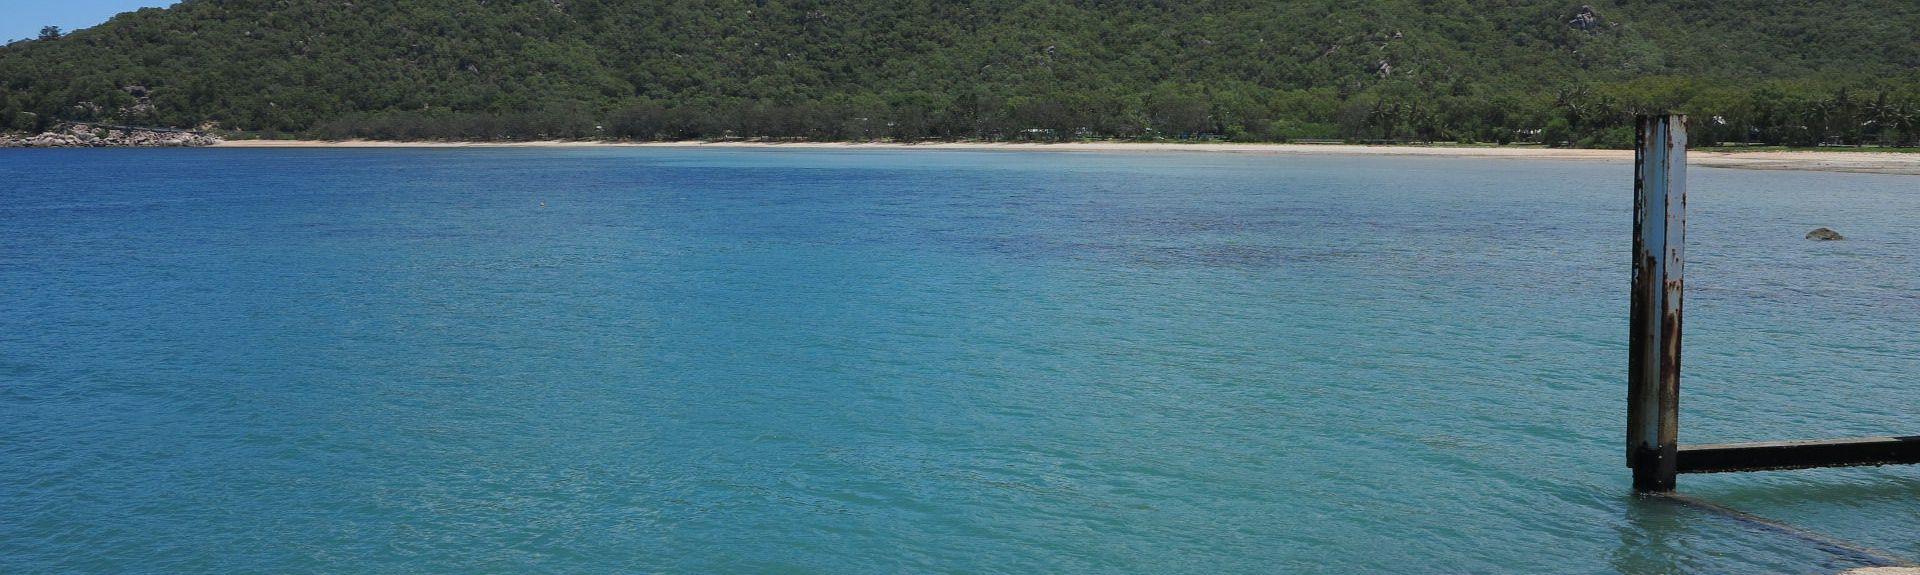 Radical Bay, Horseshoe Bay, Queensland, AU